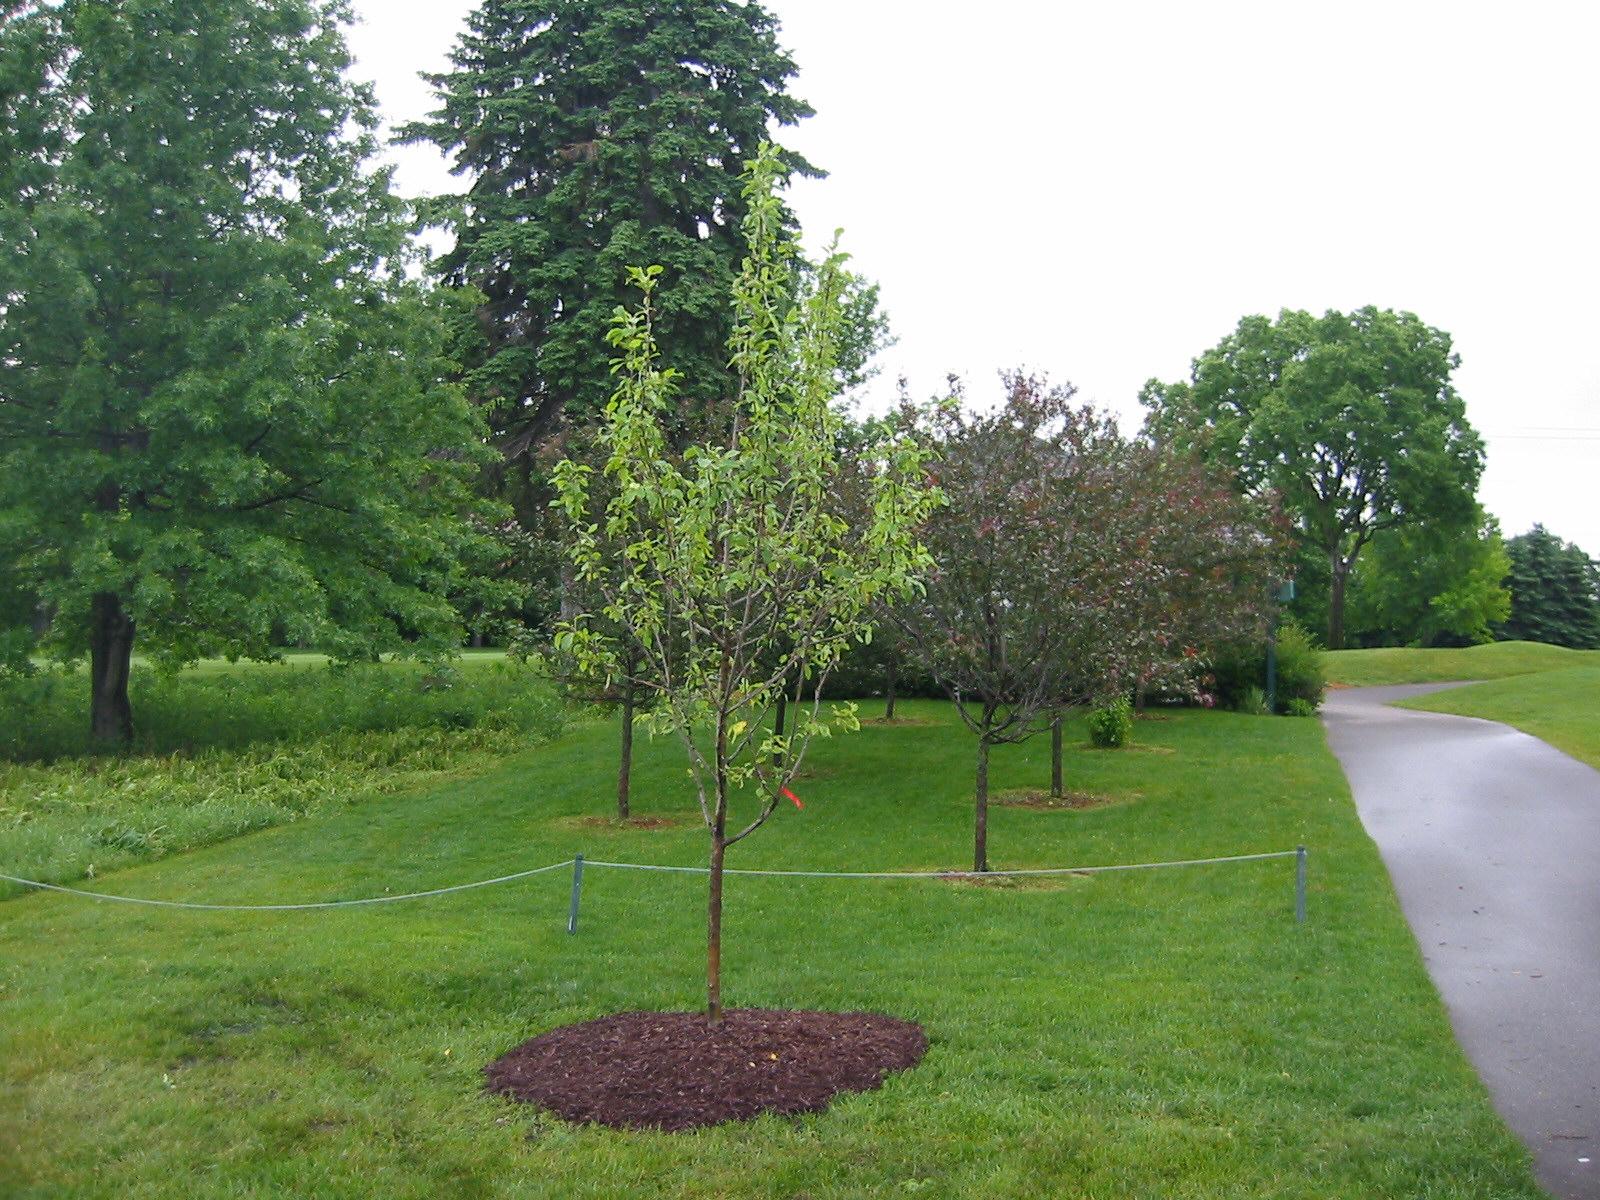 Dakota Pinnacle and Zestar Apple Trees Planted on Golf CourseZestar Apple Tree